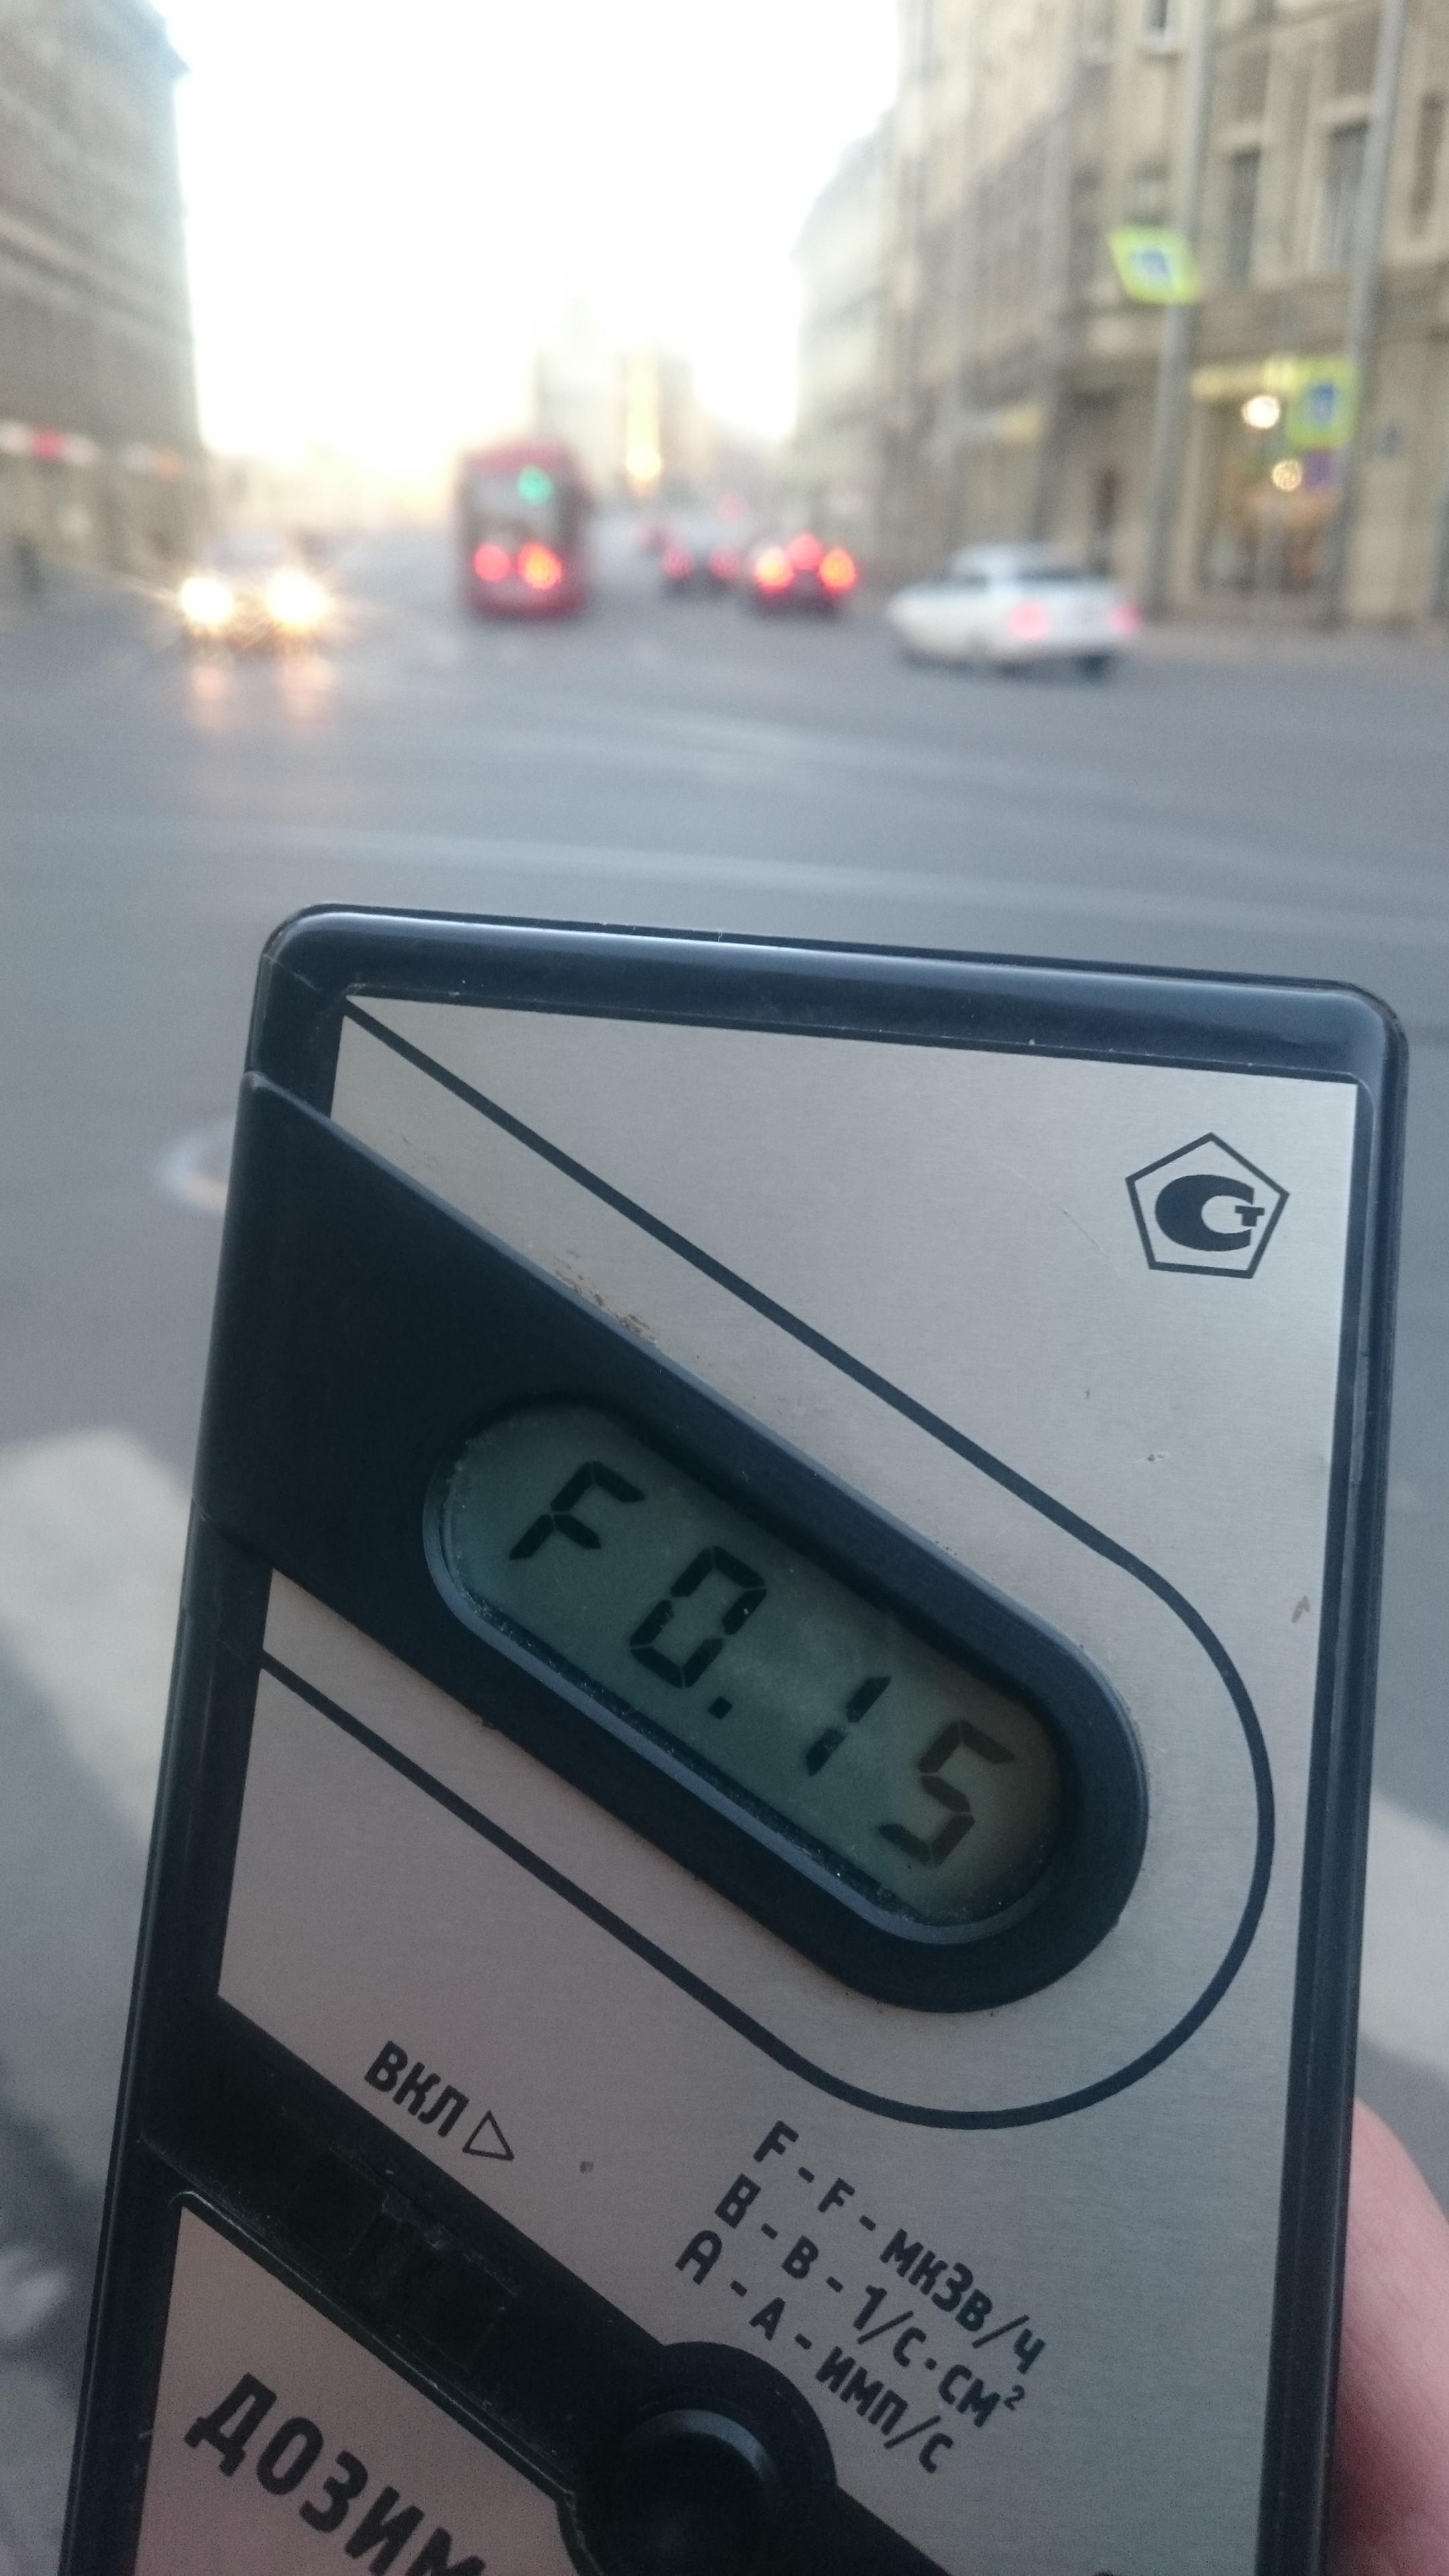 Точка измерения МЭД гамма-излучени на улице Чапаева у дома 2 в Санкт-Петербурге